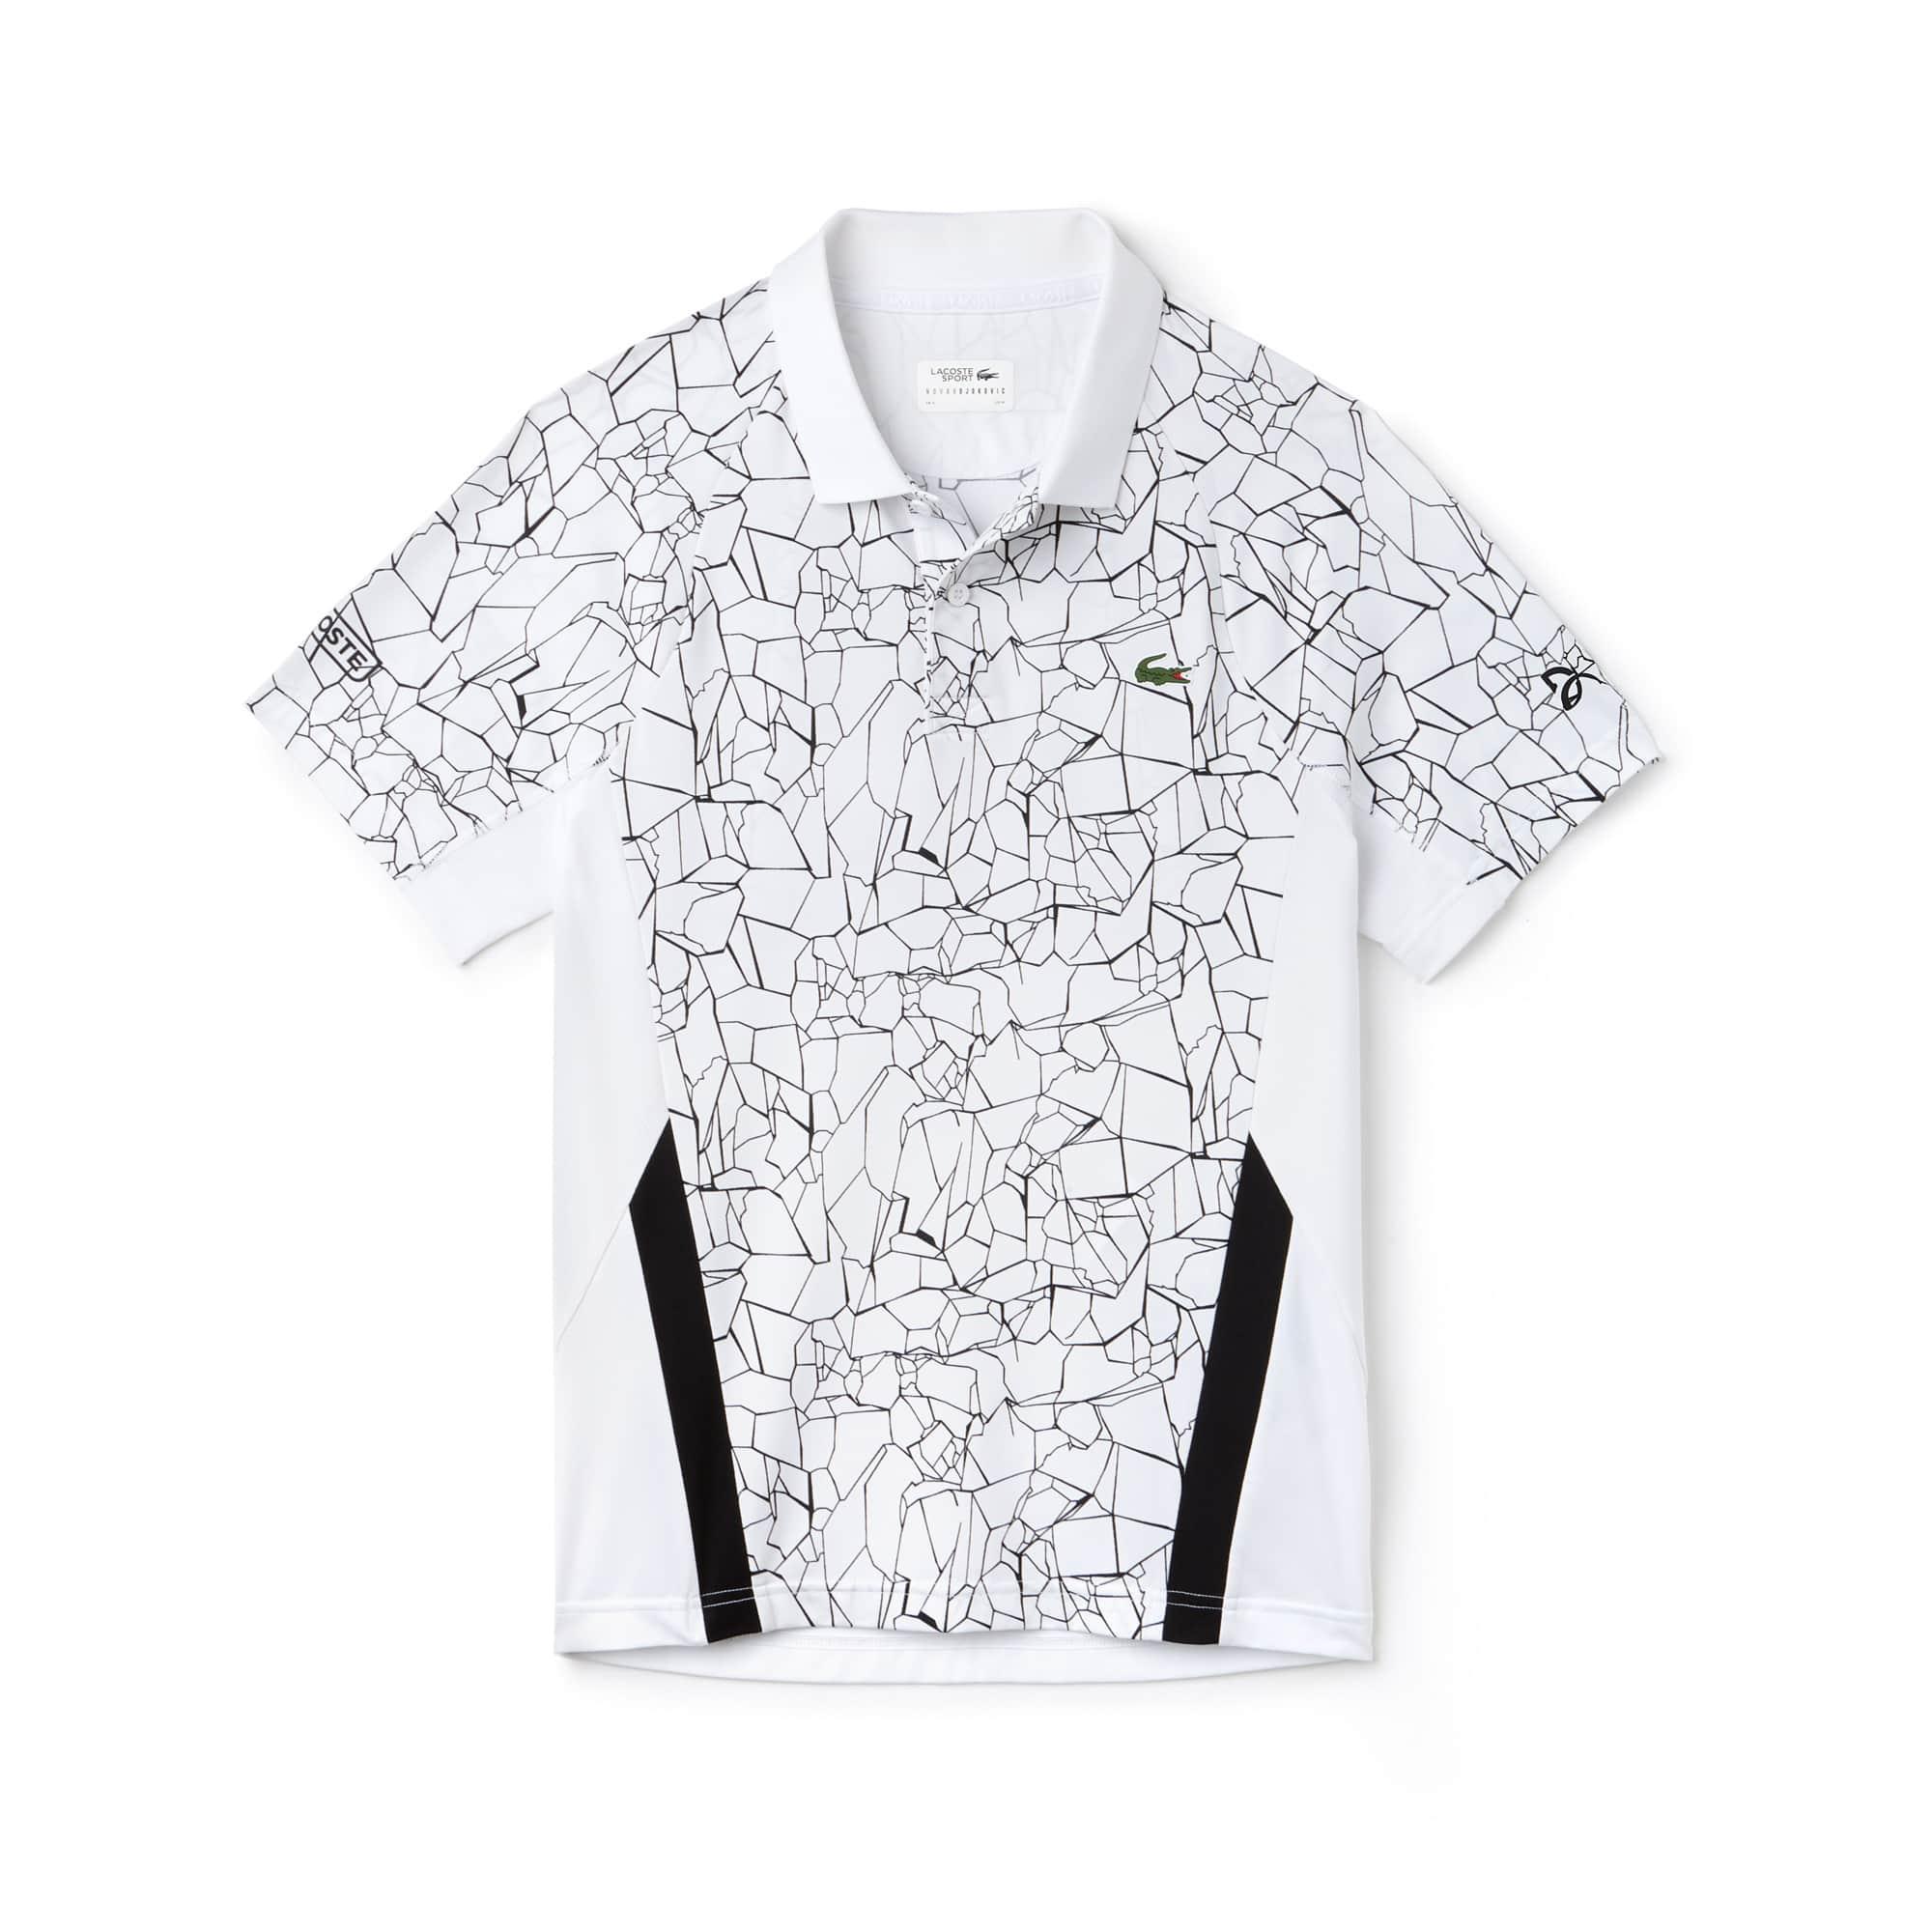 Lacoste SPORT系列诺瓦克·德约科维奇(NOVAK DJOKOVIC)合作款球场系列印花科技平纹针织面料男士Polo衫